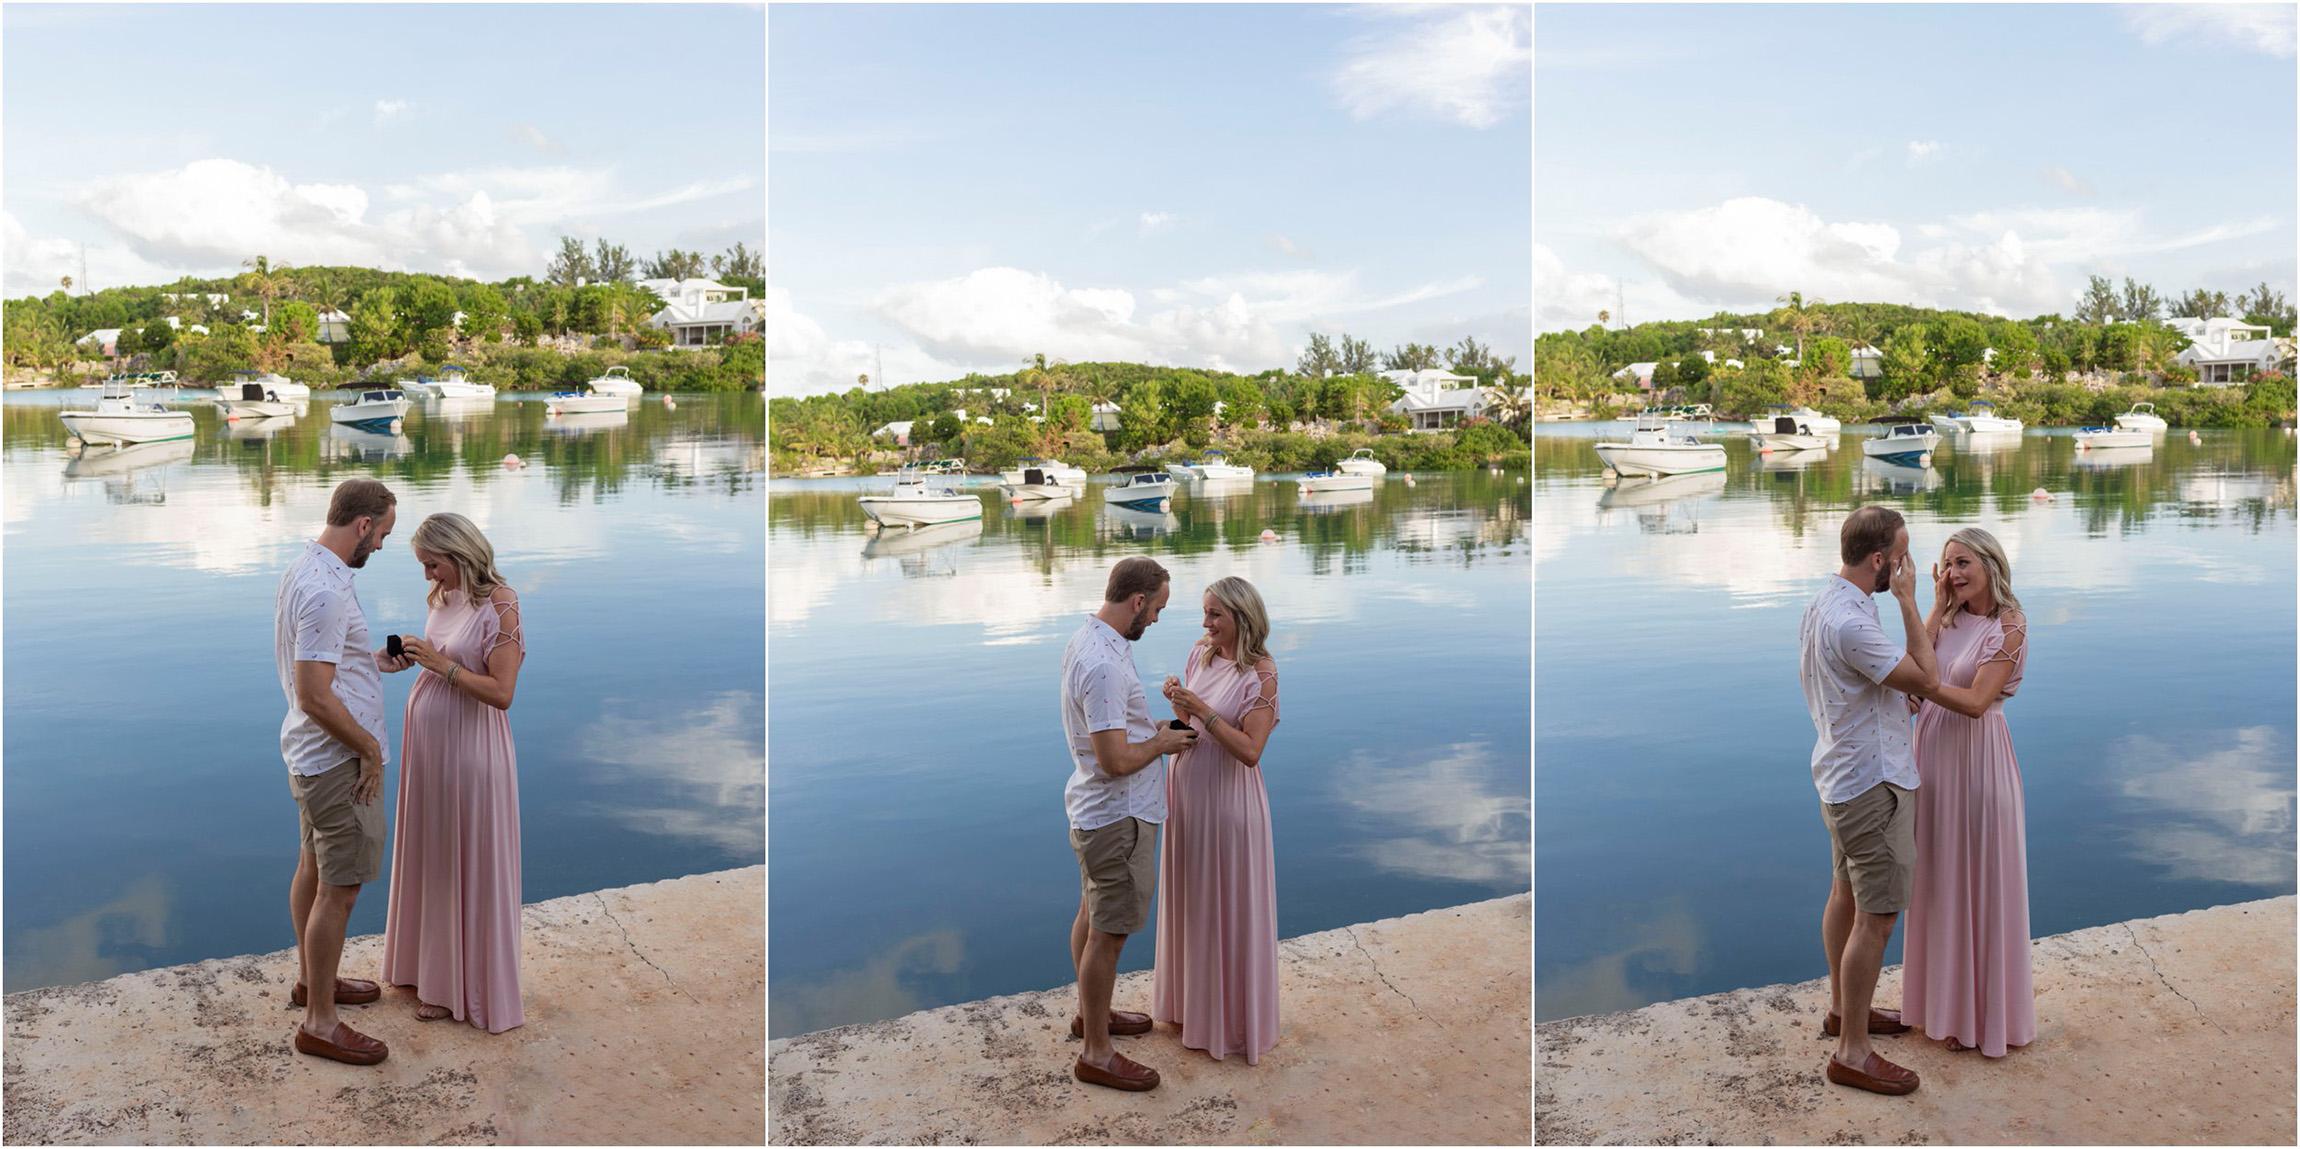 ©FianderFoto_Bermuda_Tom Moore's Jungle_Proposal Maternity Photographer_Erika_Andy_006.jpg